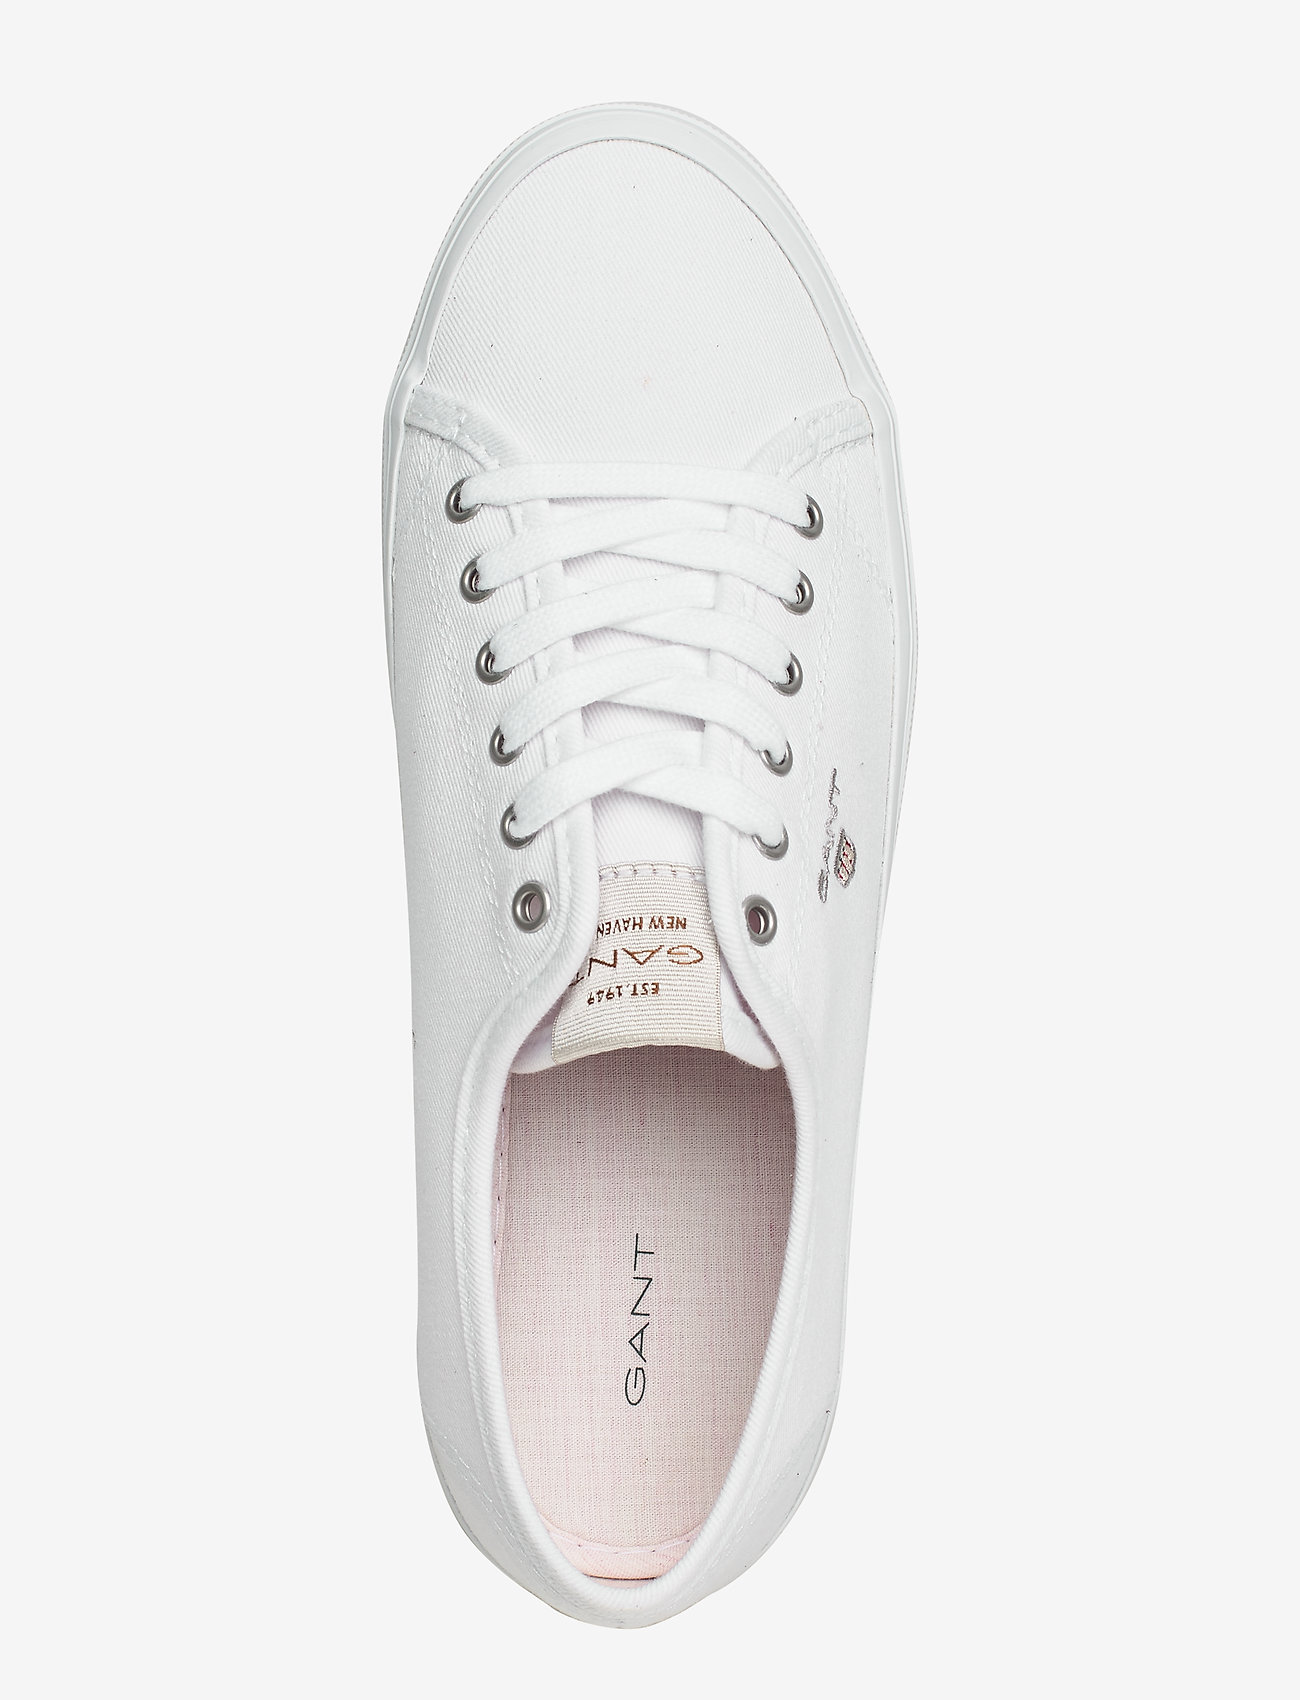 Preptown Low Lace Shoes (Bright White) (449.25 kr) - GANT